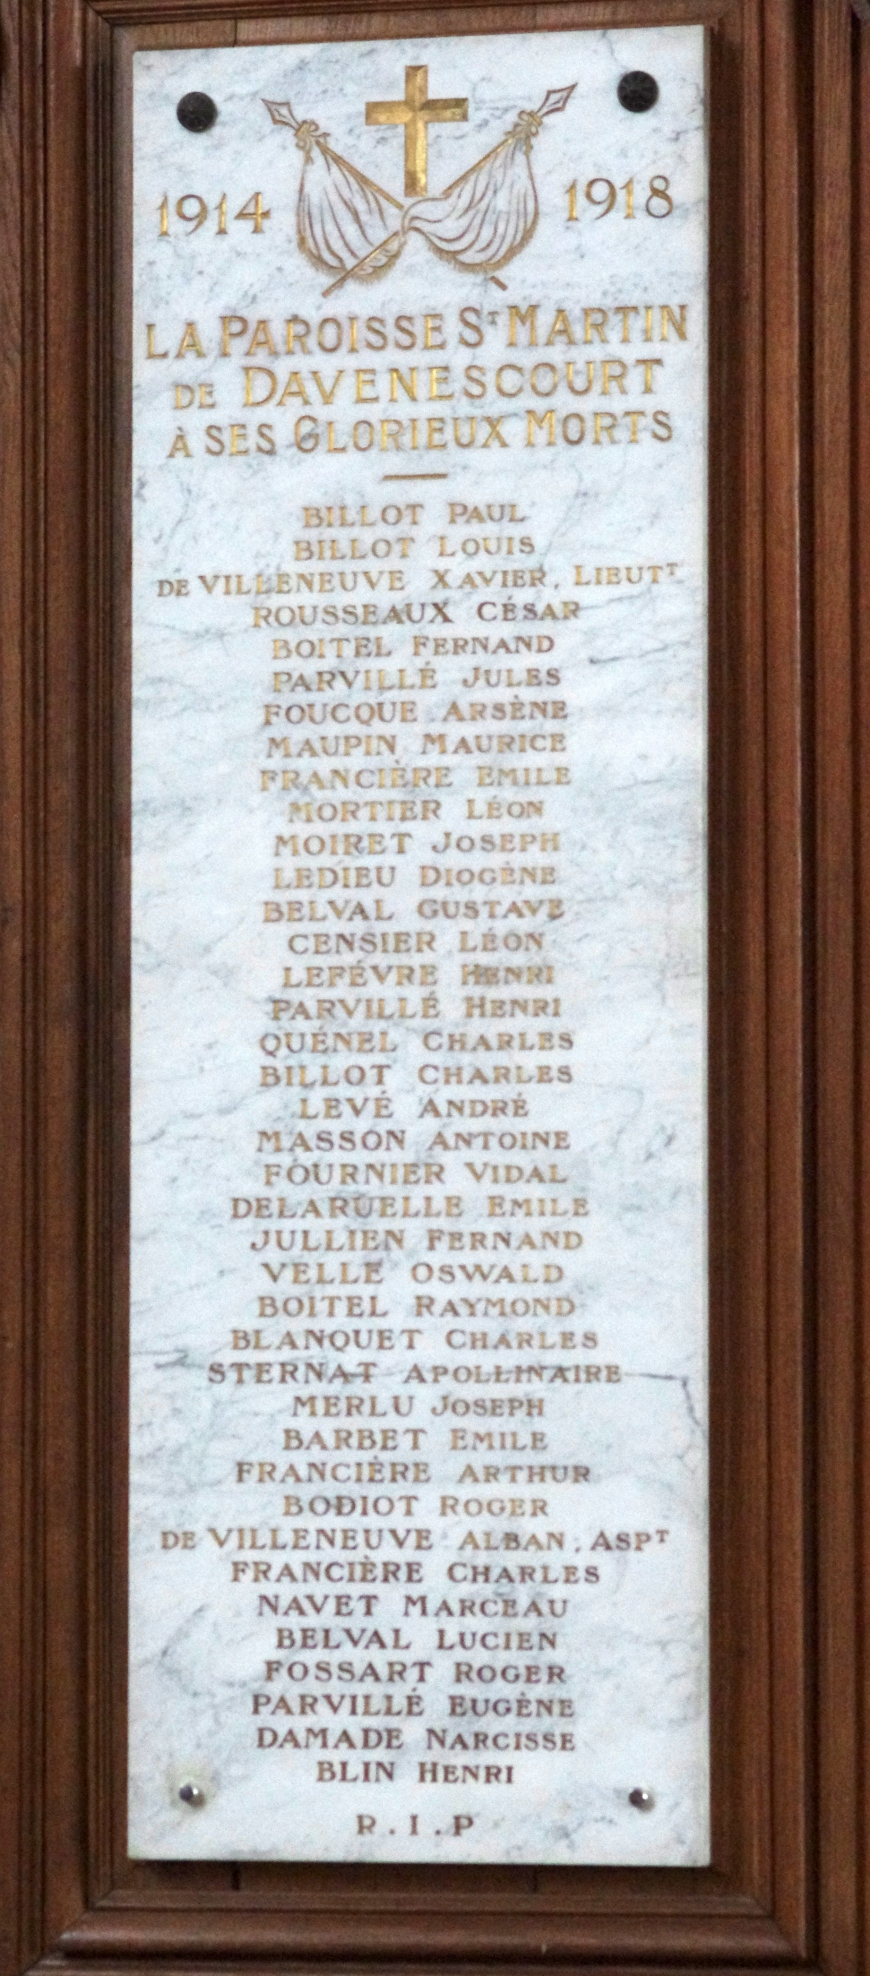 Davenescourt-plaque eglise